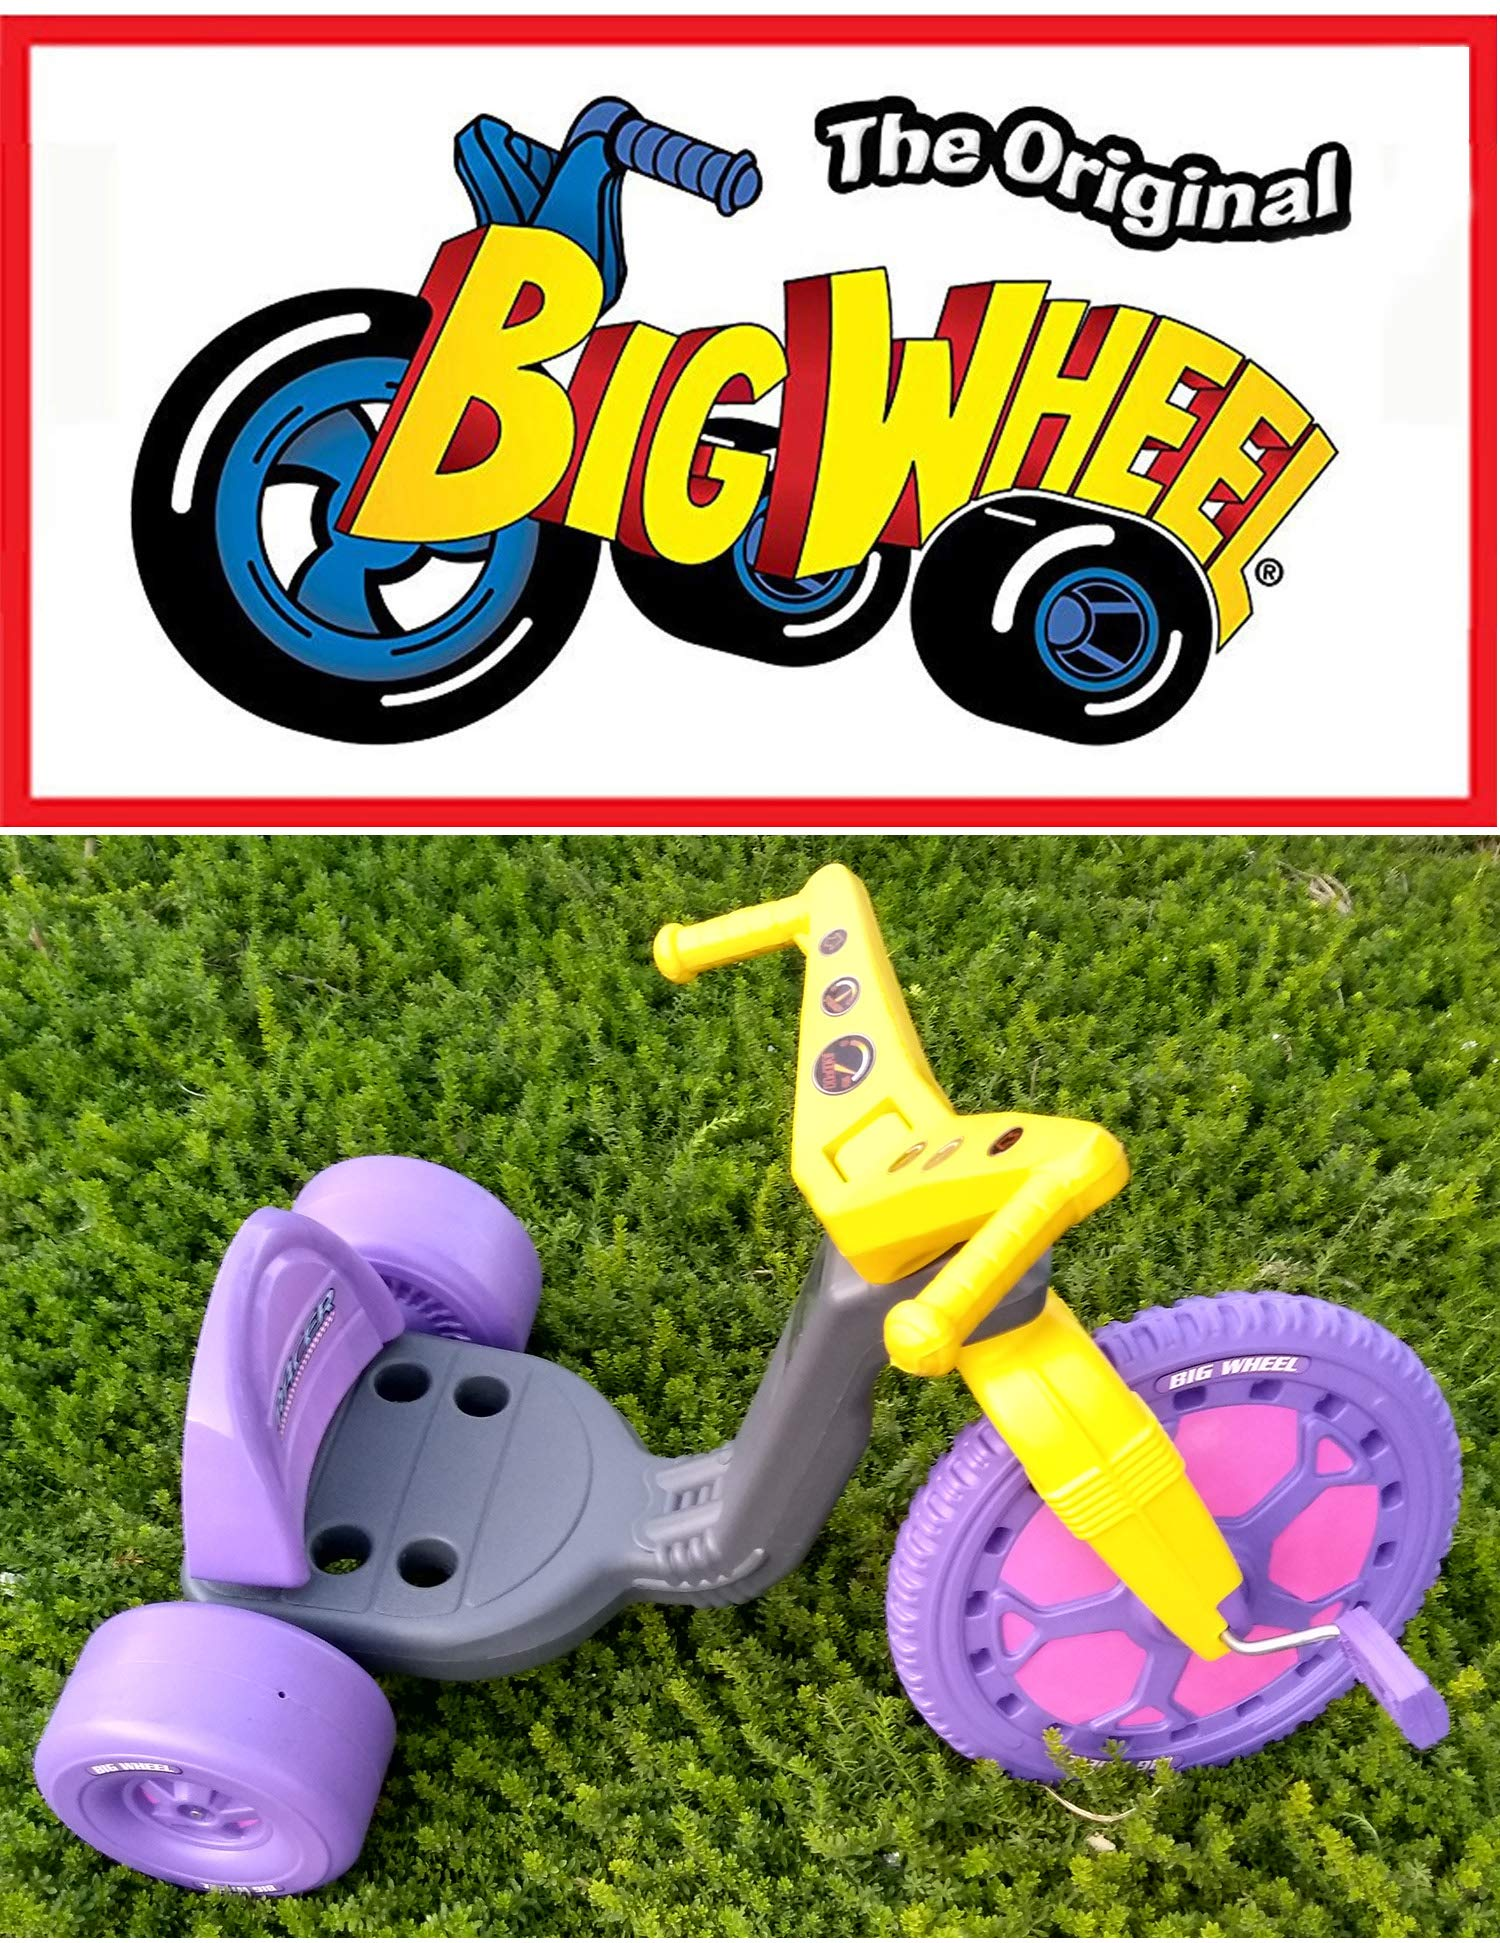 The Original Big Wheel Trike 16'' Gray & Purple with Pink Decals